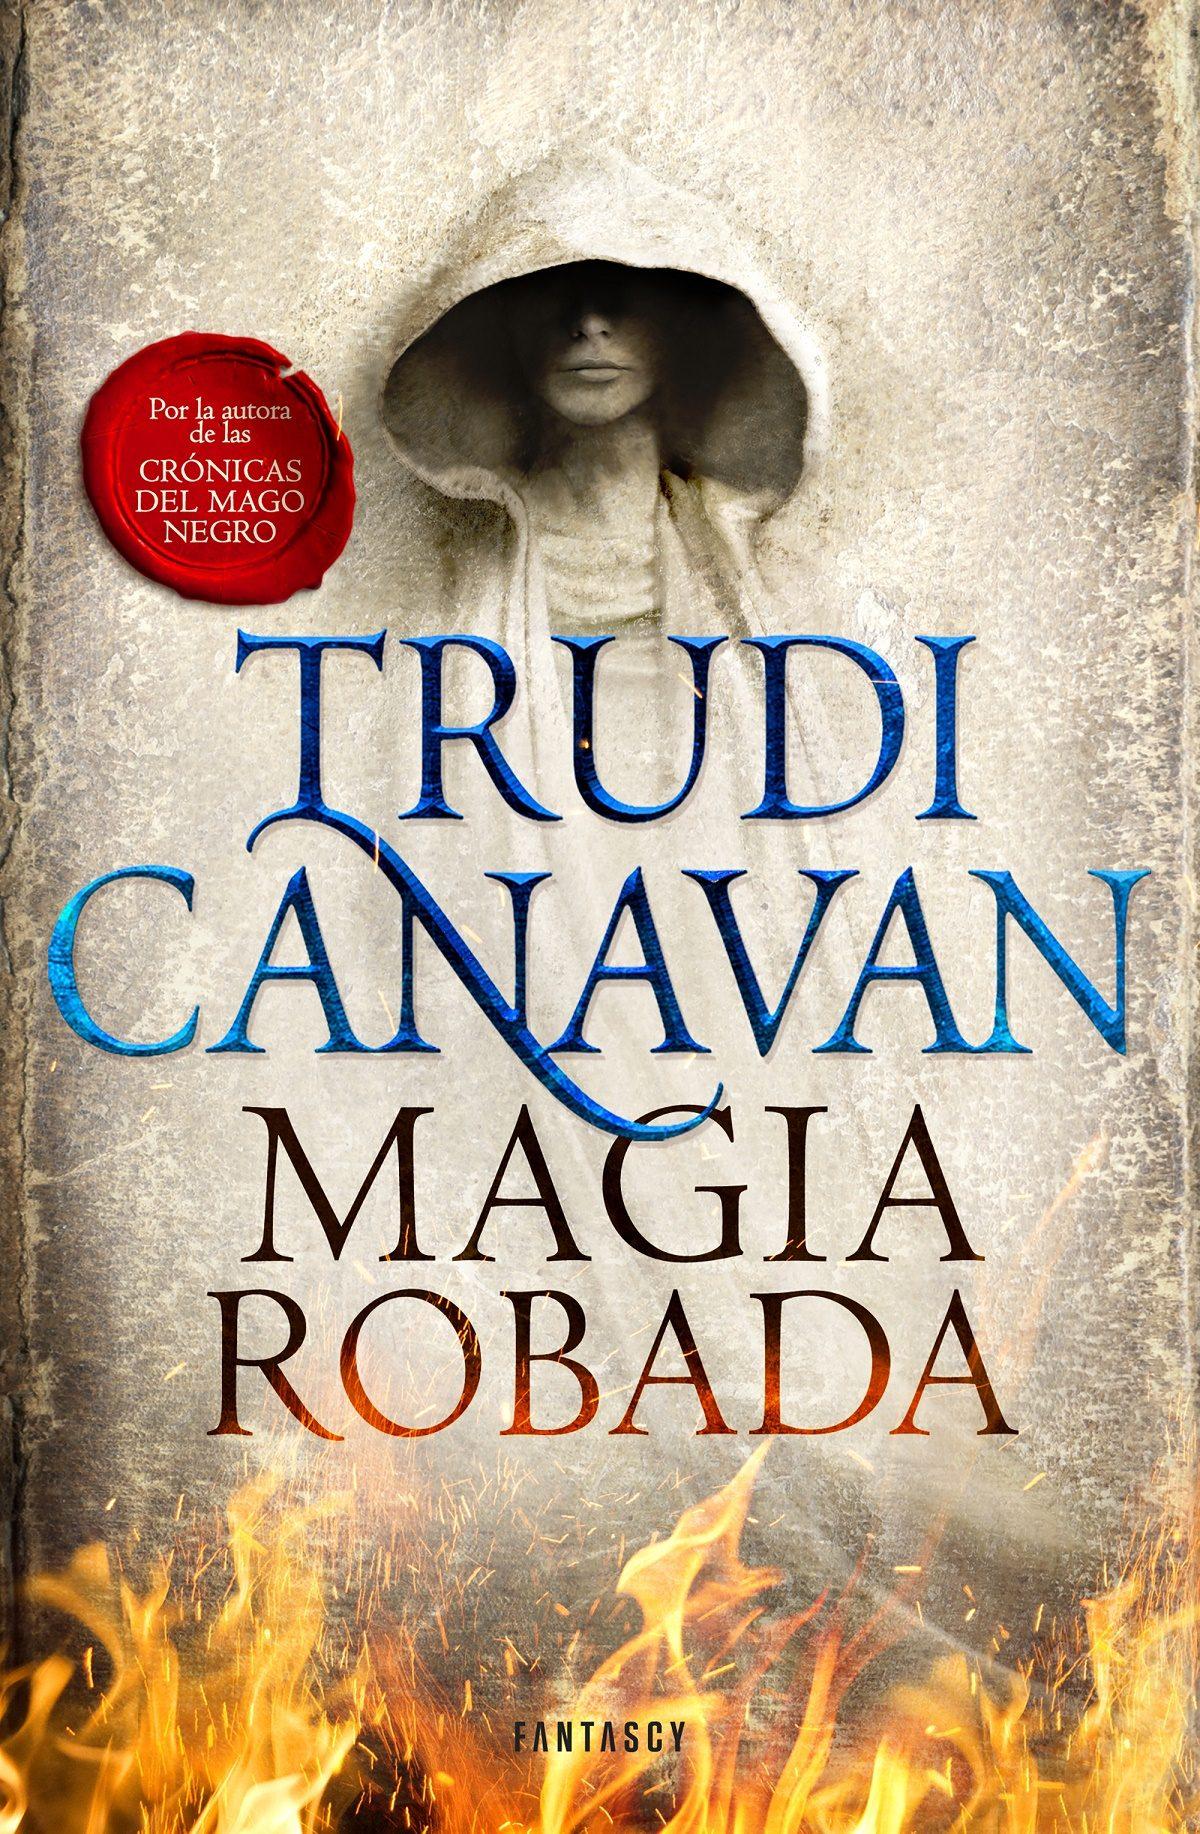 Magia Robada - Trudi Canavan - Campana